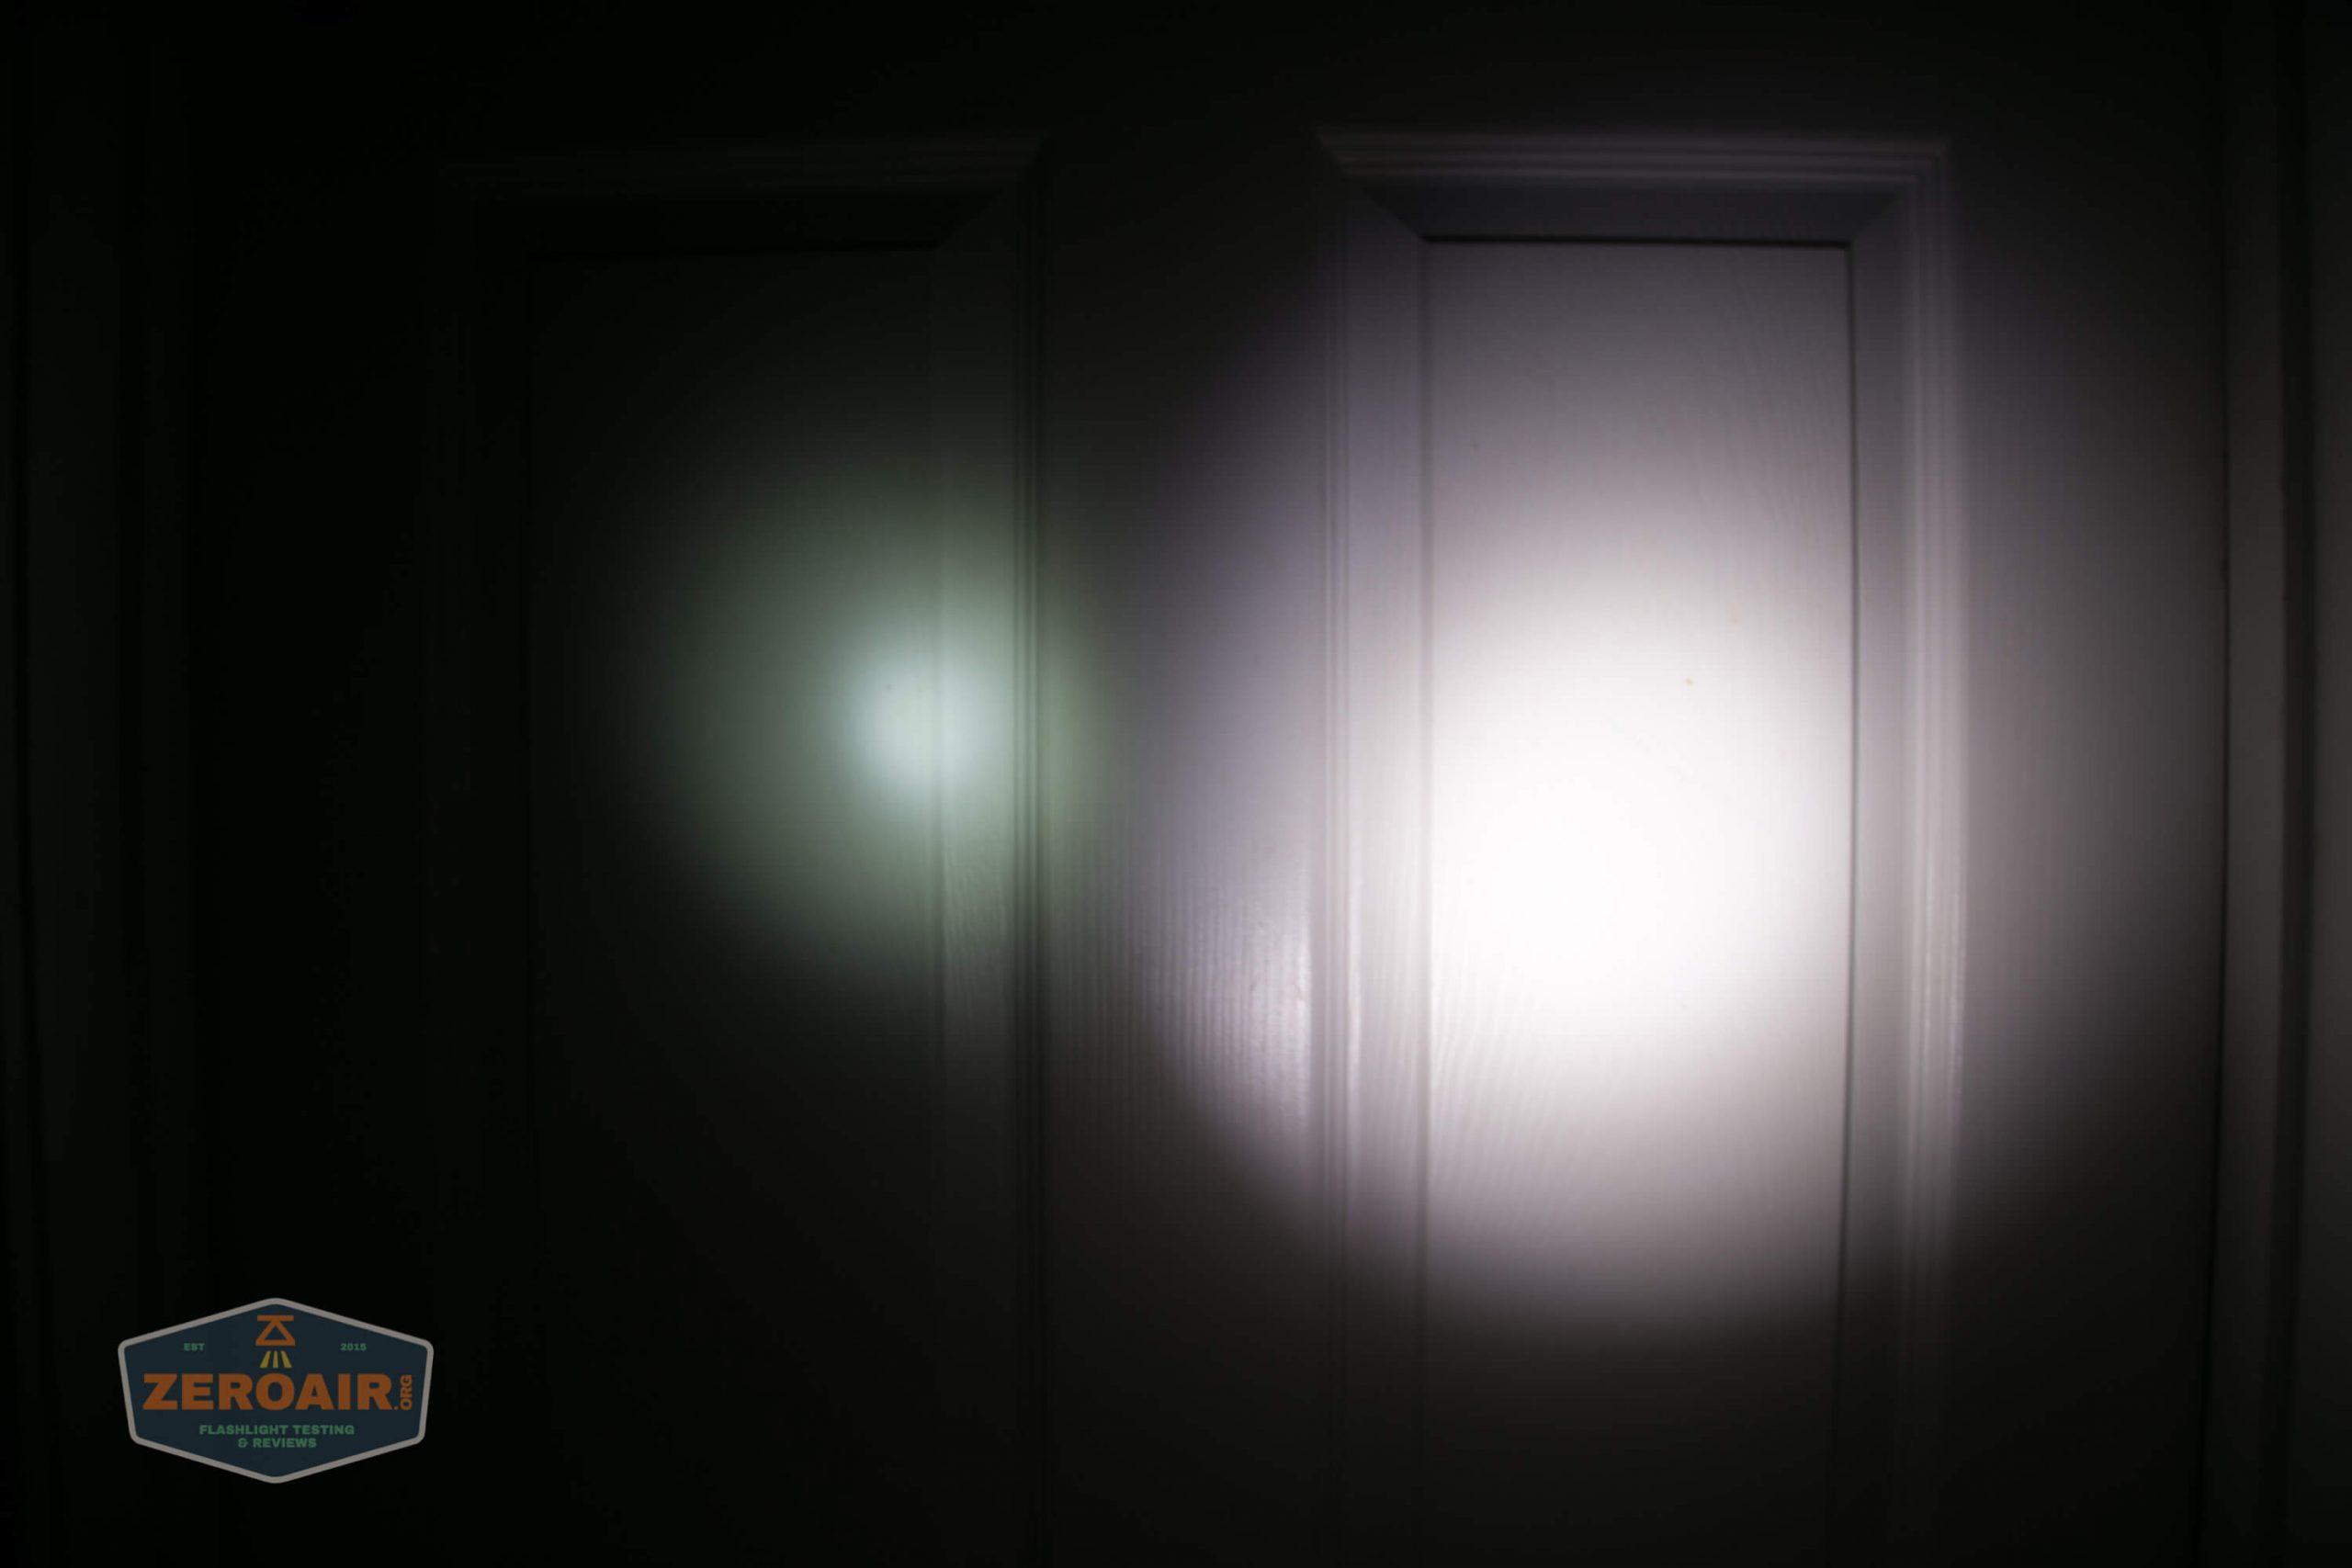 fireflylite e01 luminus sst-40 21700 beamshot door vs blf-348 1